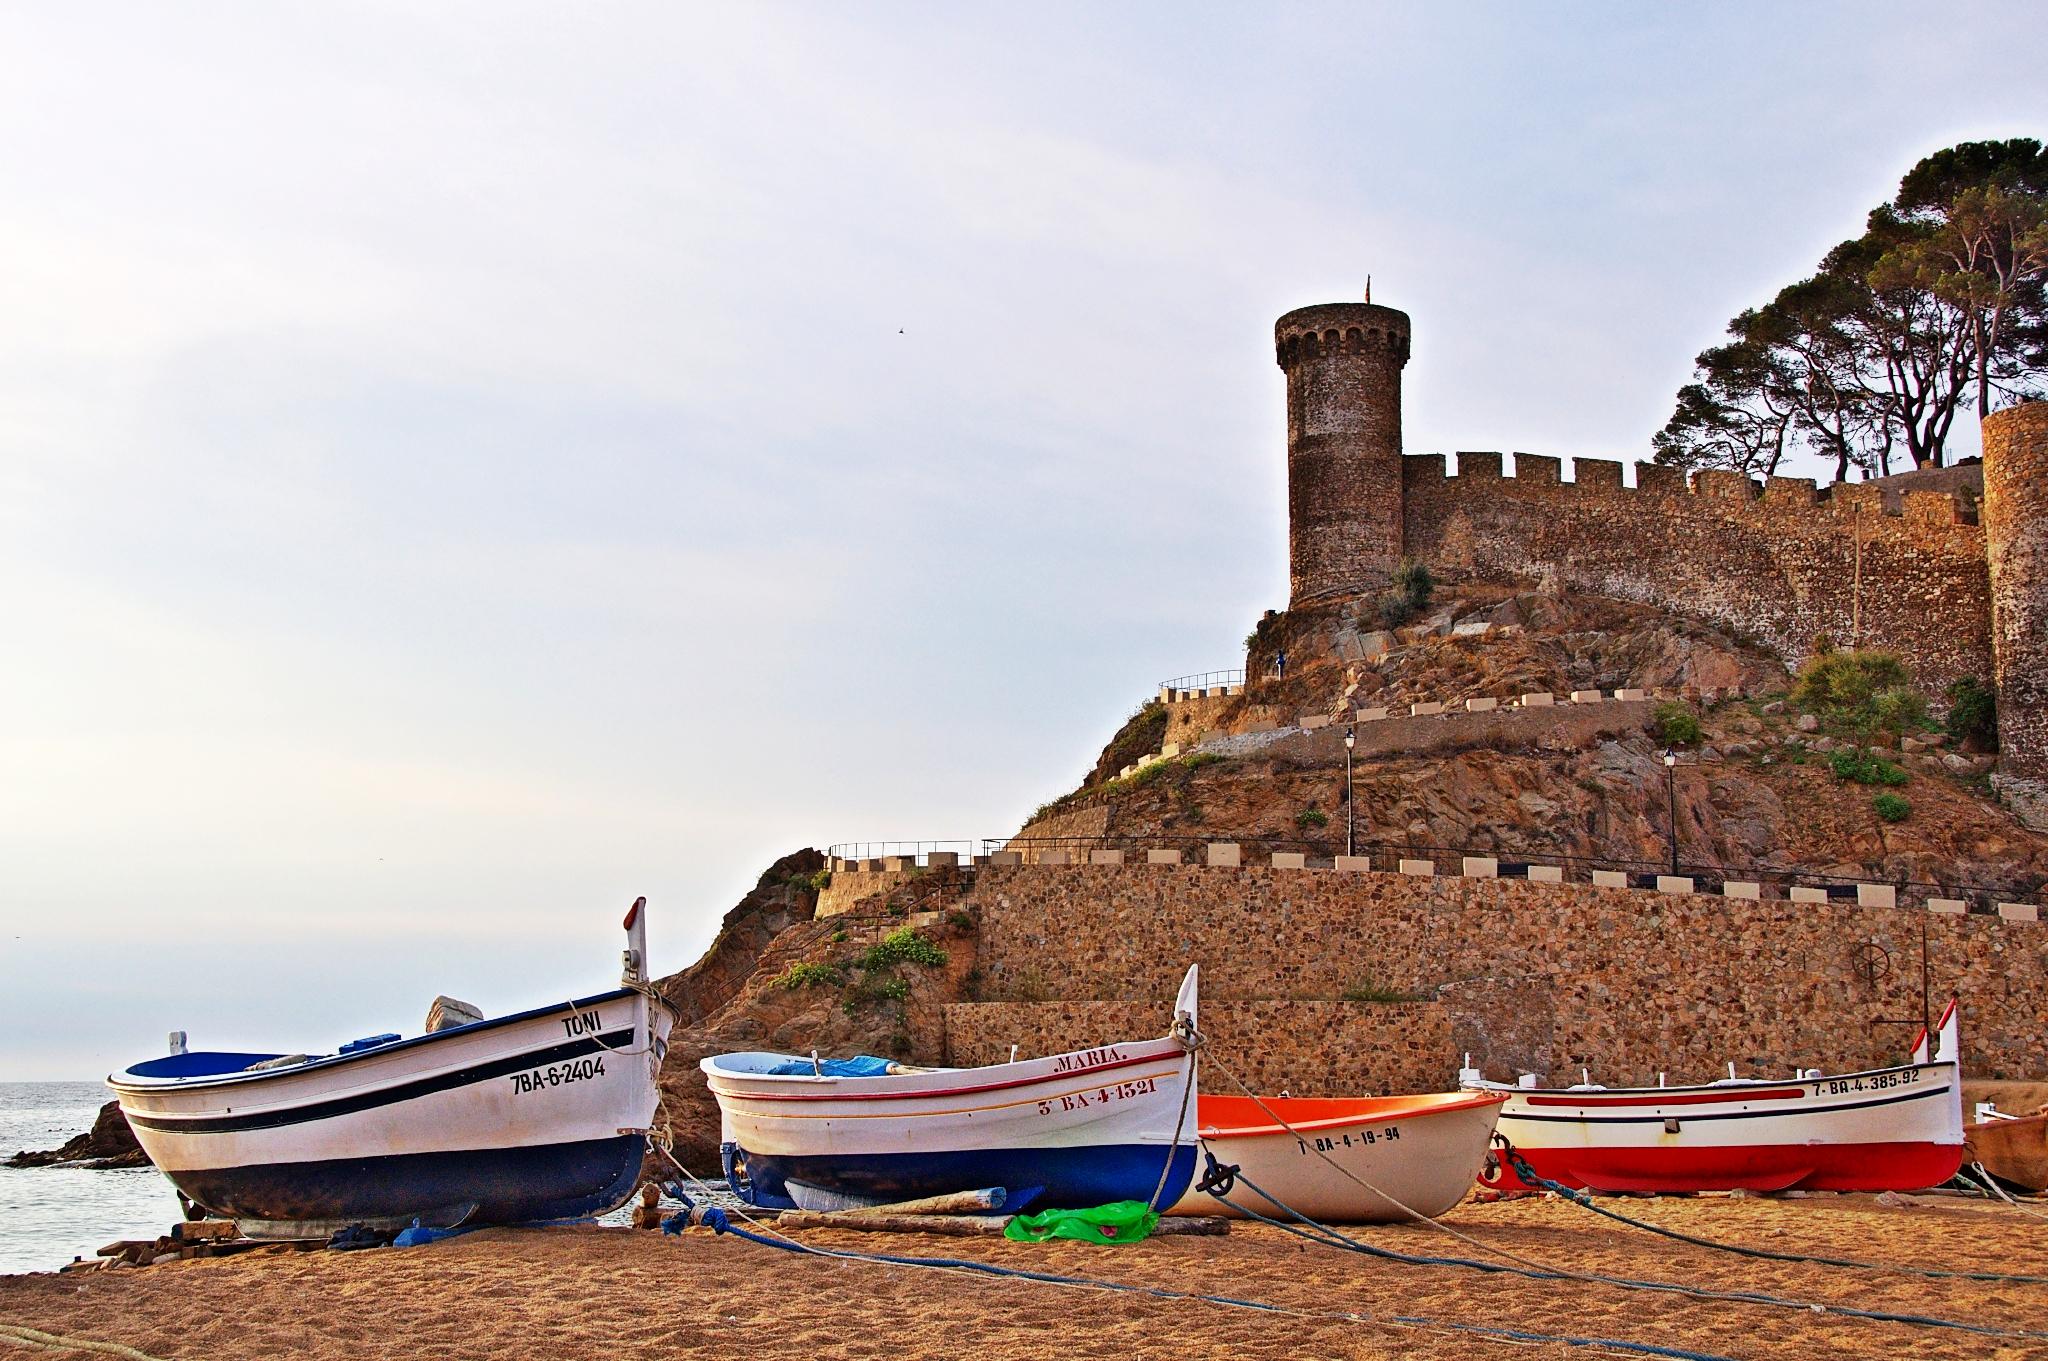 Camping Costa Brava, camping Espagne, camping bord de mer, camping mer et soleil, location mobil home